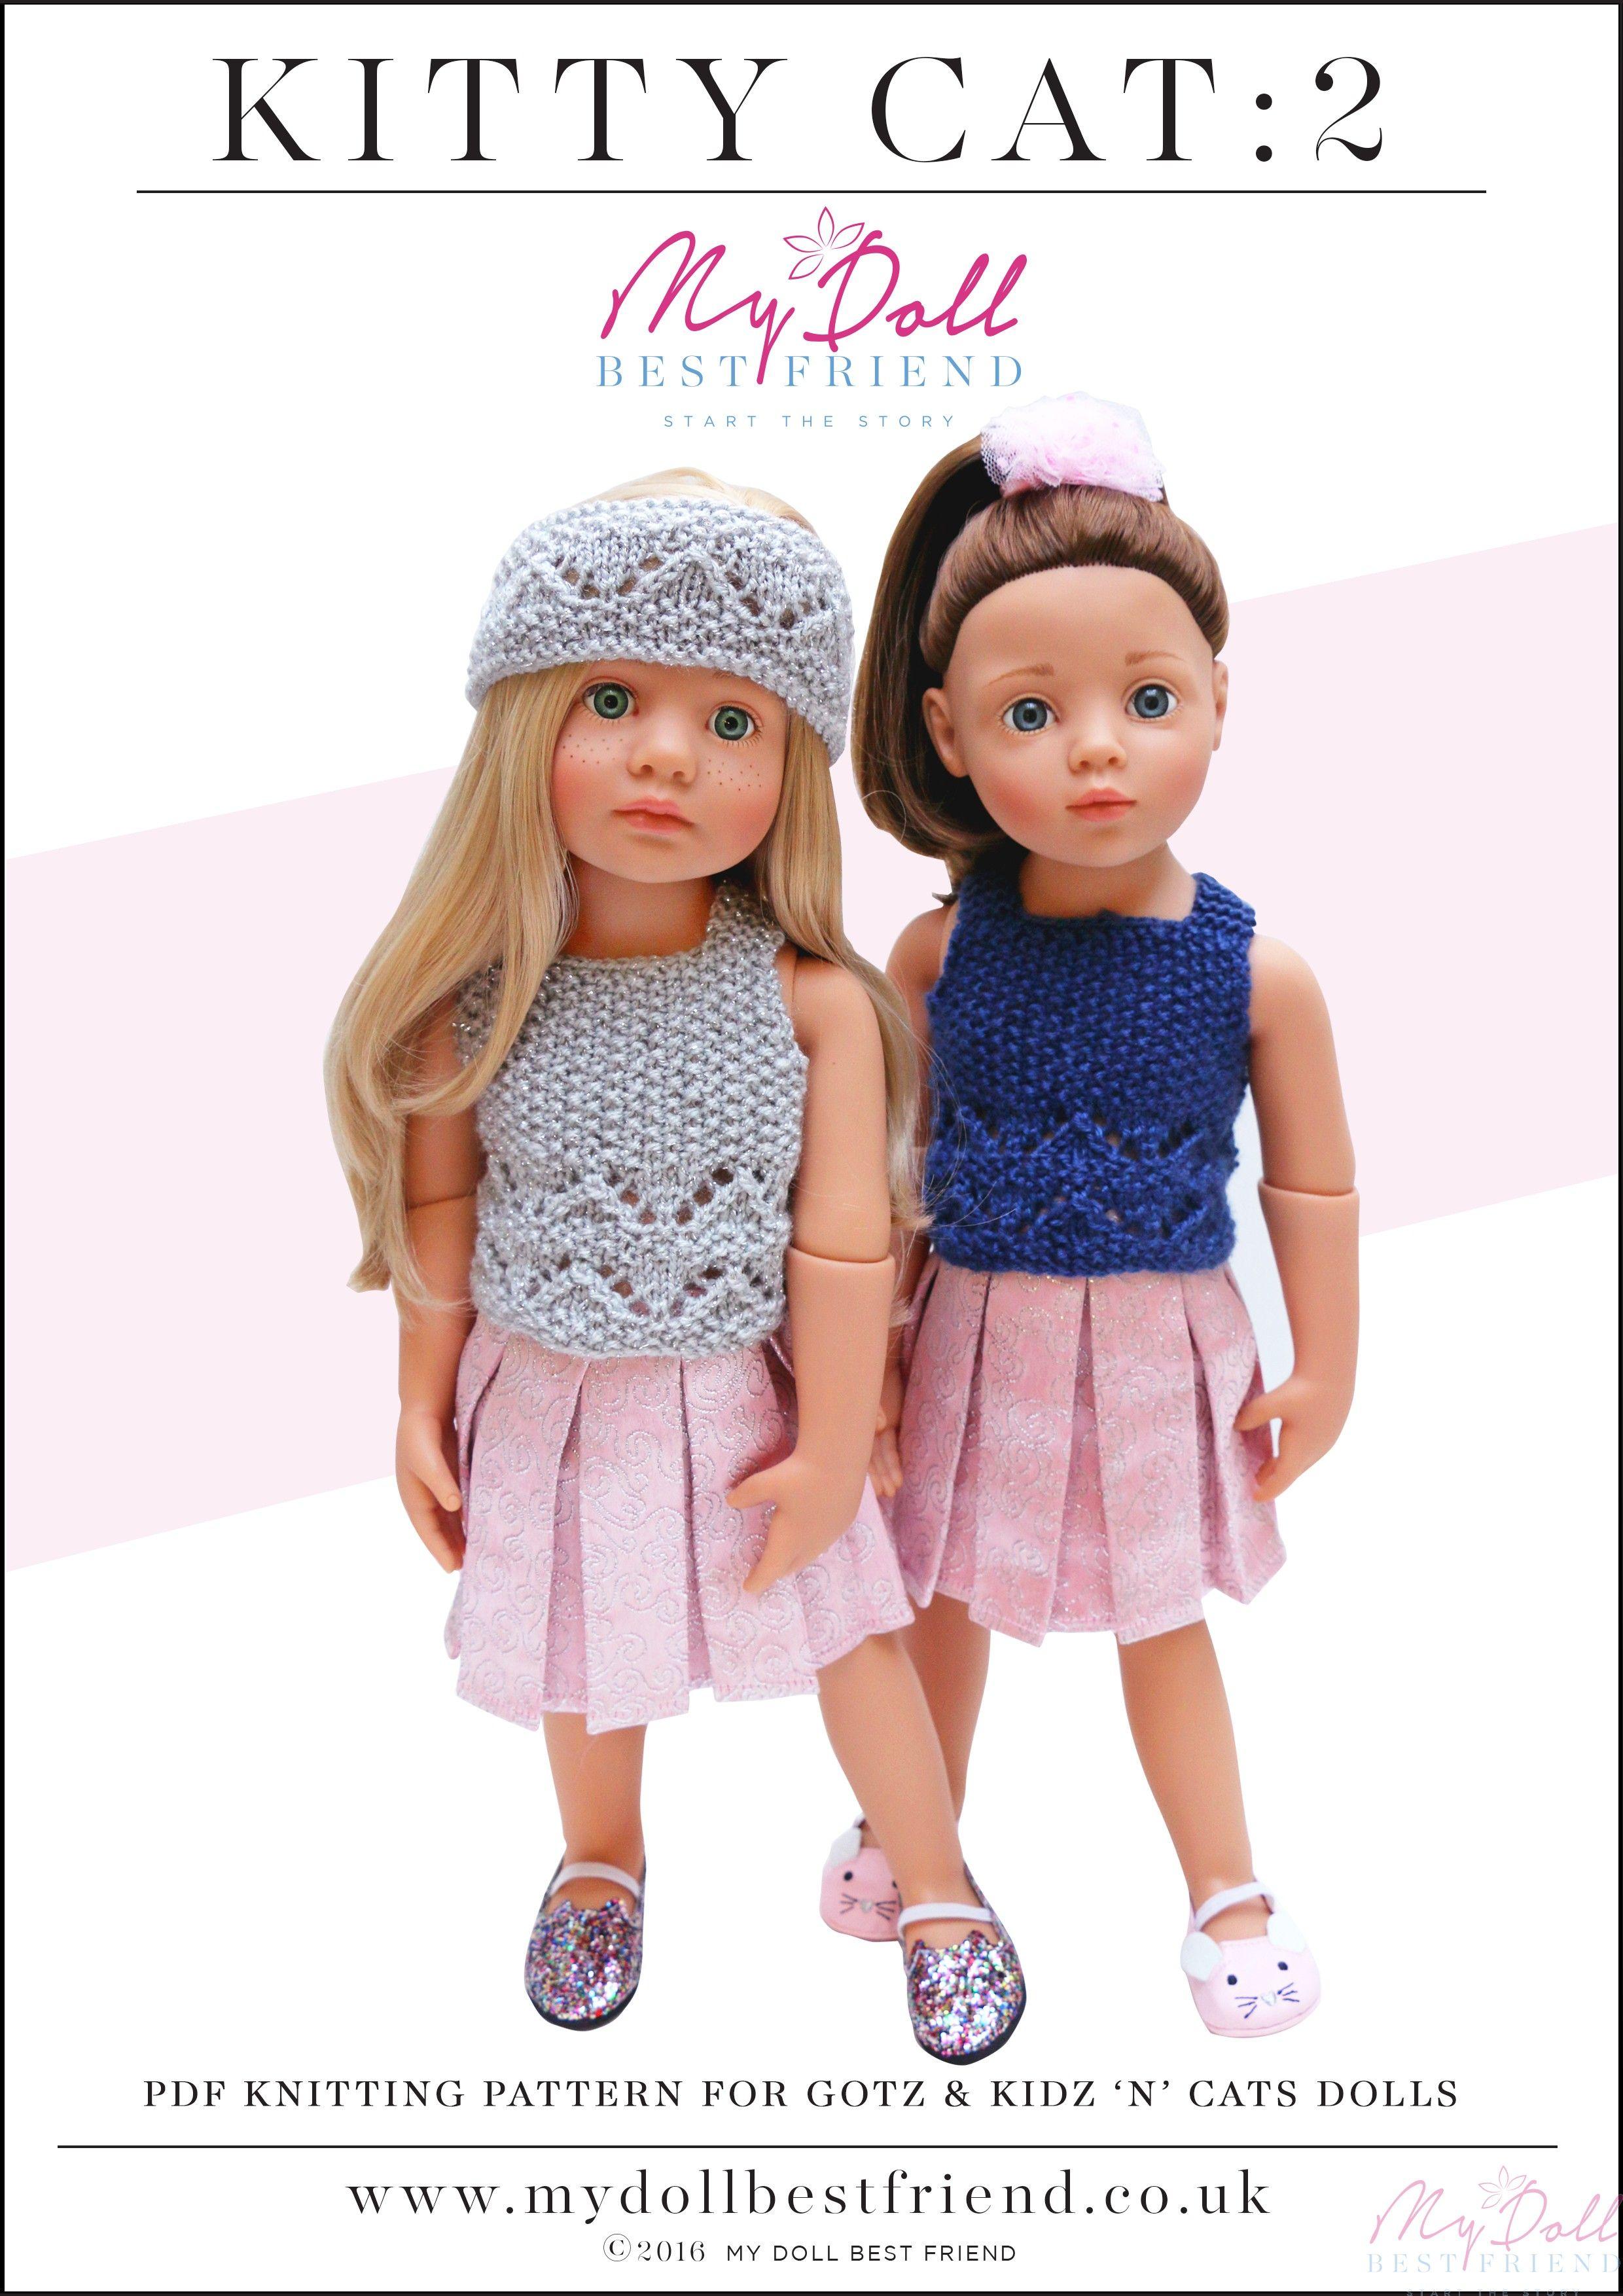 Doll Knitting Pattern 45-50cm: Kitty Cat 2 | Kidz n Cats | Pinterest ...